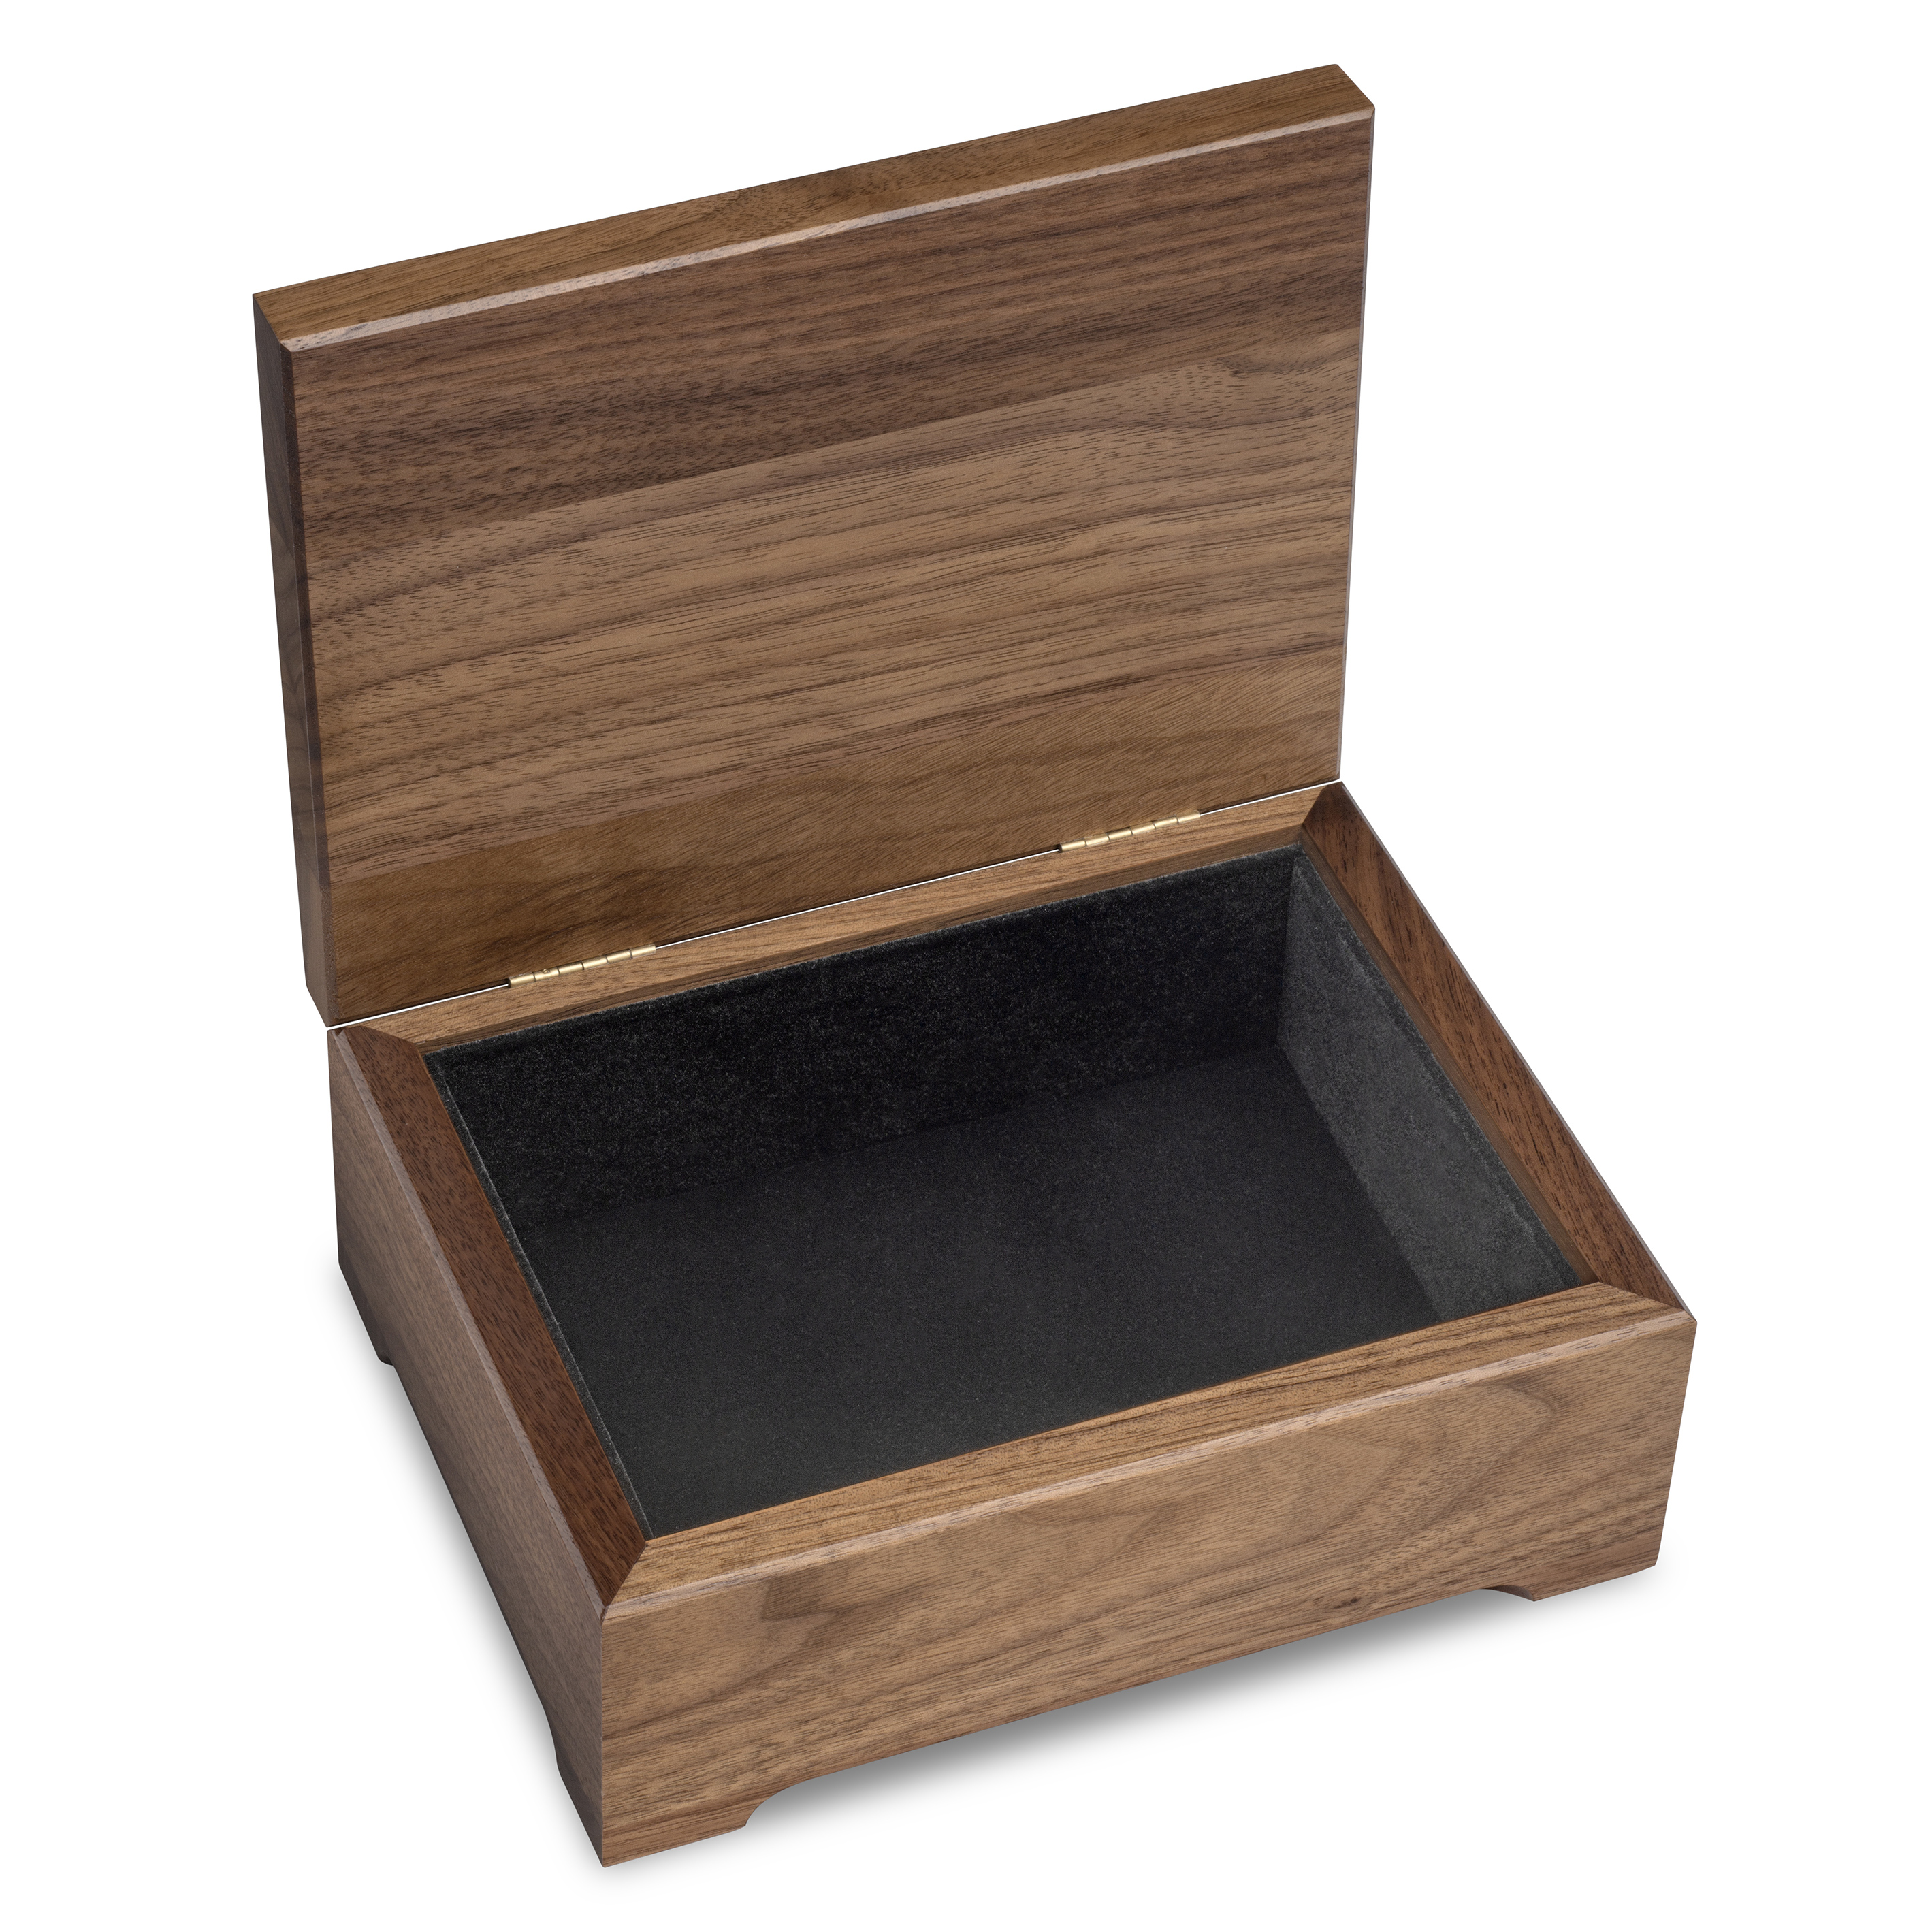 Virginia Tech Solid Walnut Desk Box - Image 2